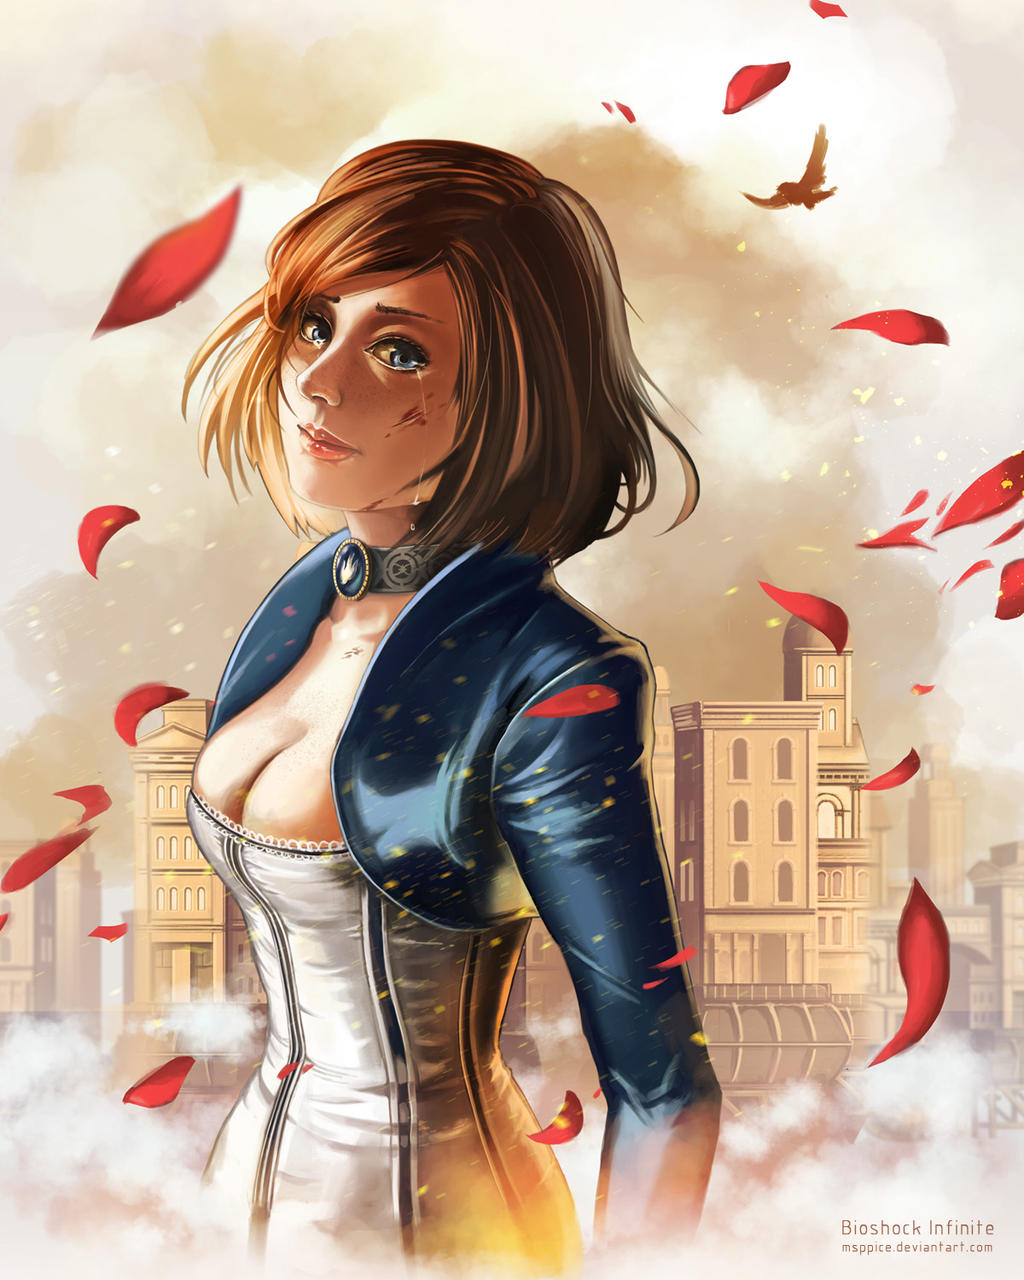 Bioshock Infinite - Elizabeth by mSppice